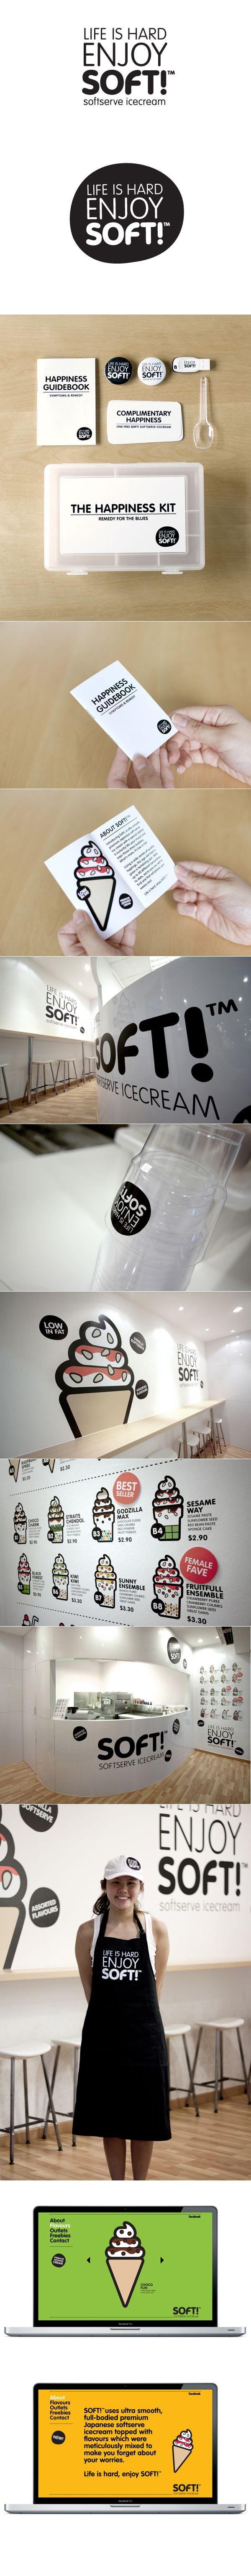 SoftTM branding by Bravo Company. Yumm #identity #packaging #branding